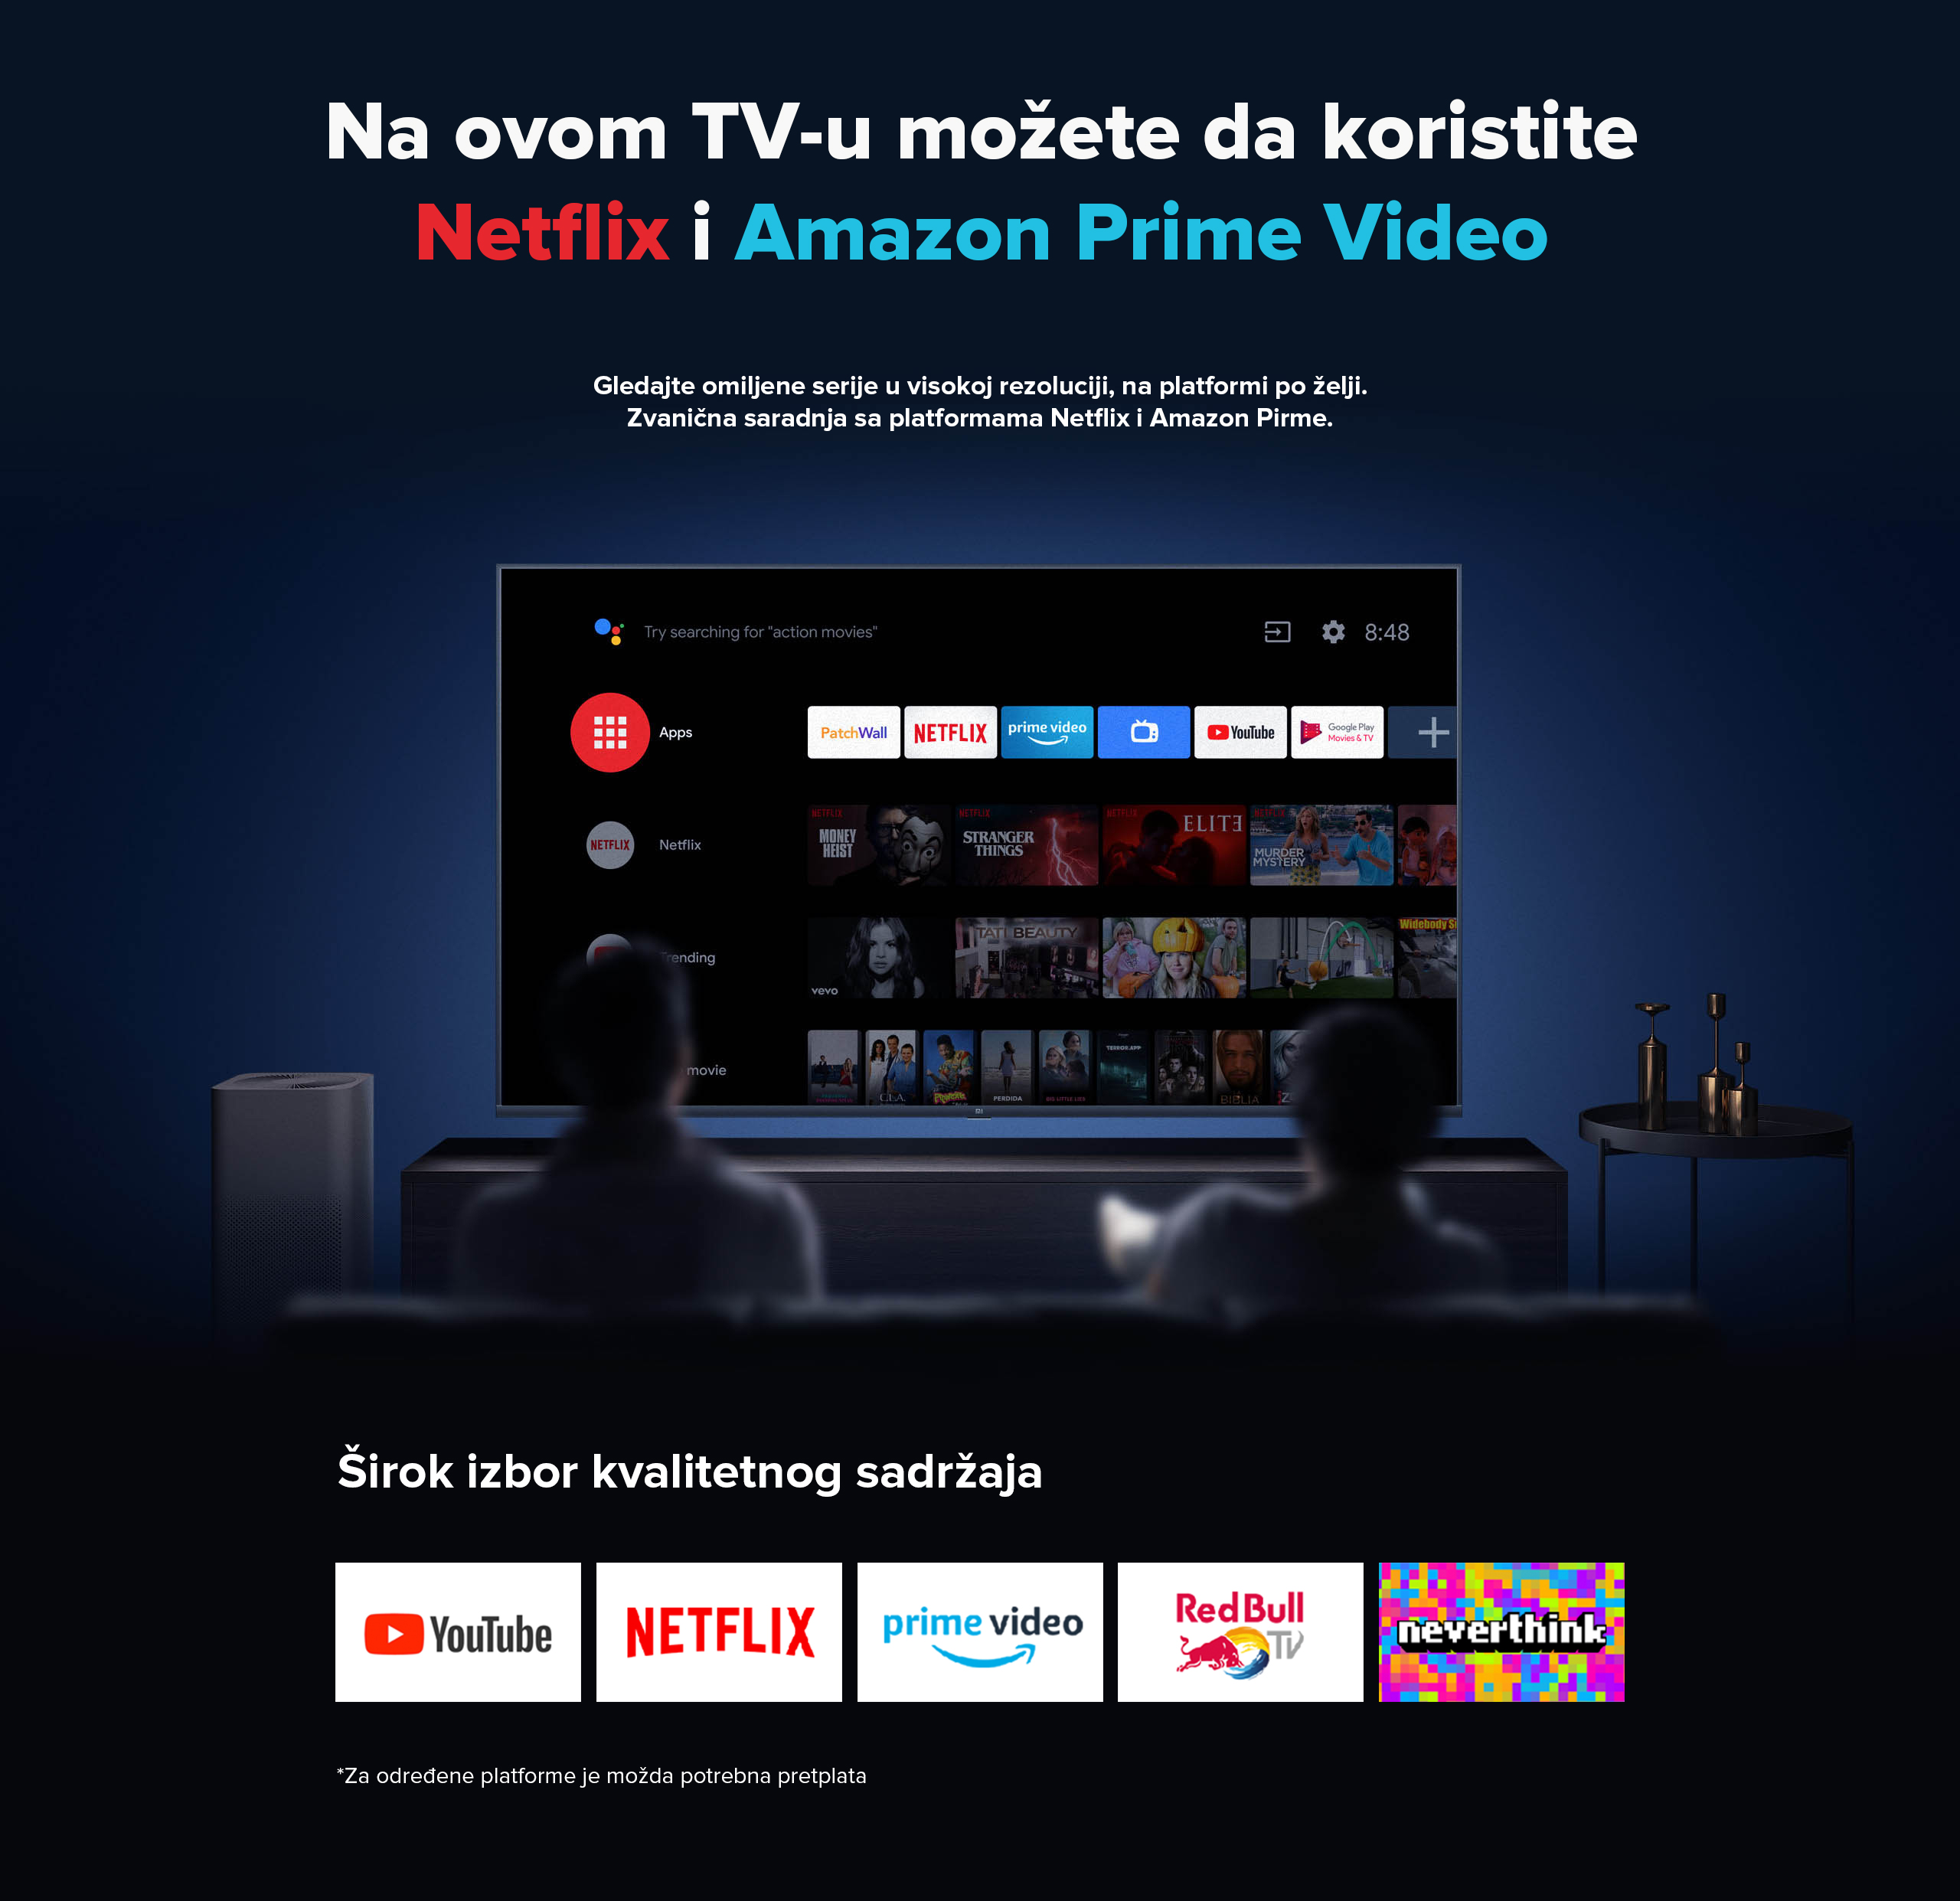 https://mi-srbija.rs/storage/media/2020/11/5/90918c30-acef-4ee4-9016-0341ba80b0dc.jpg